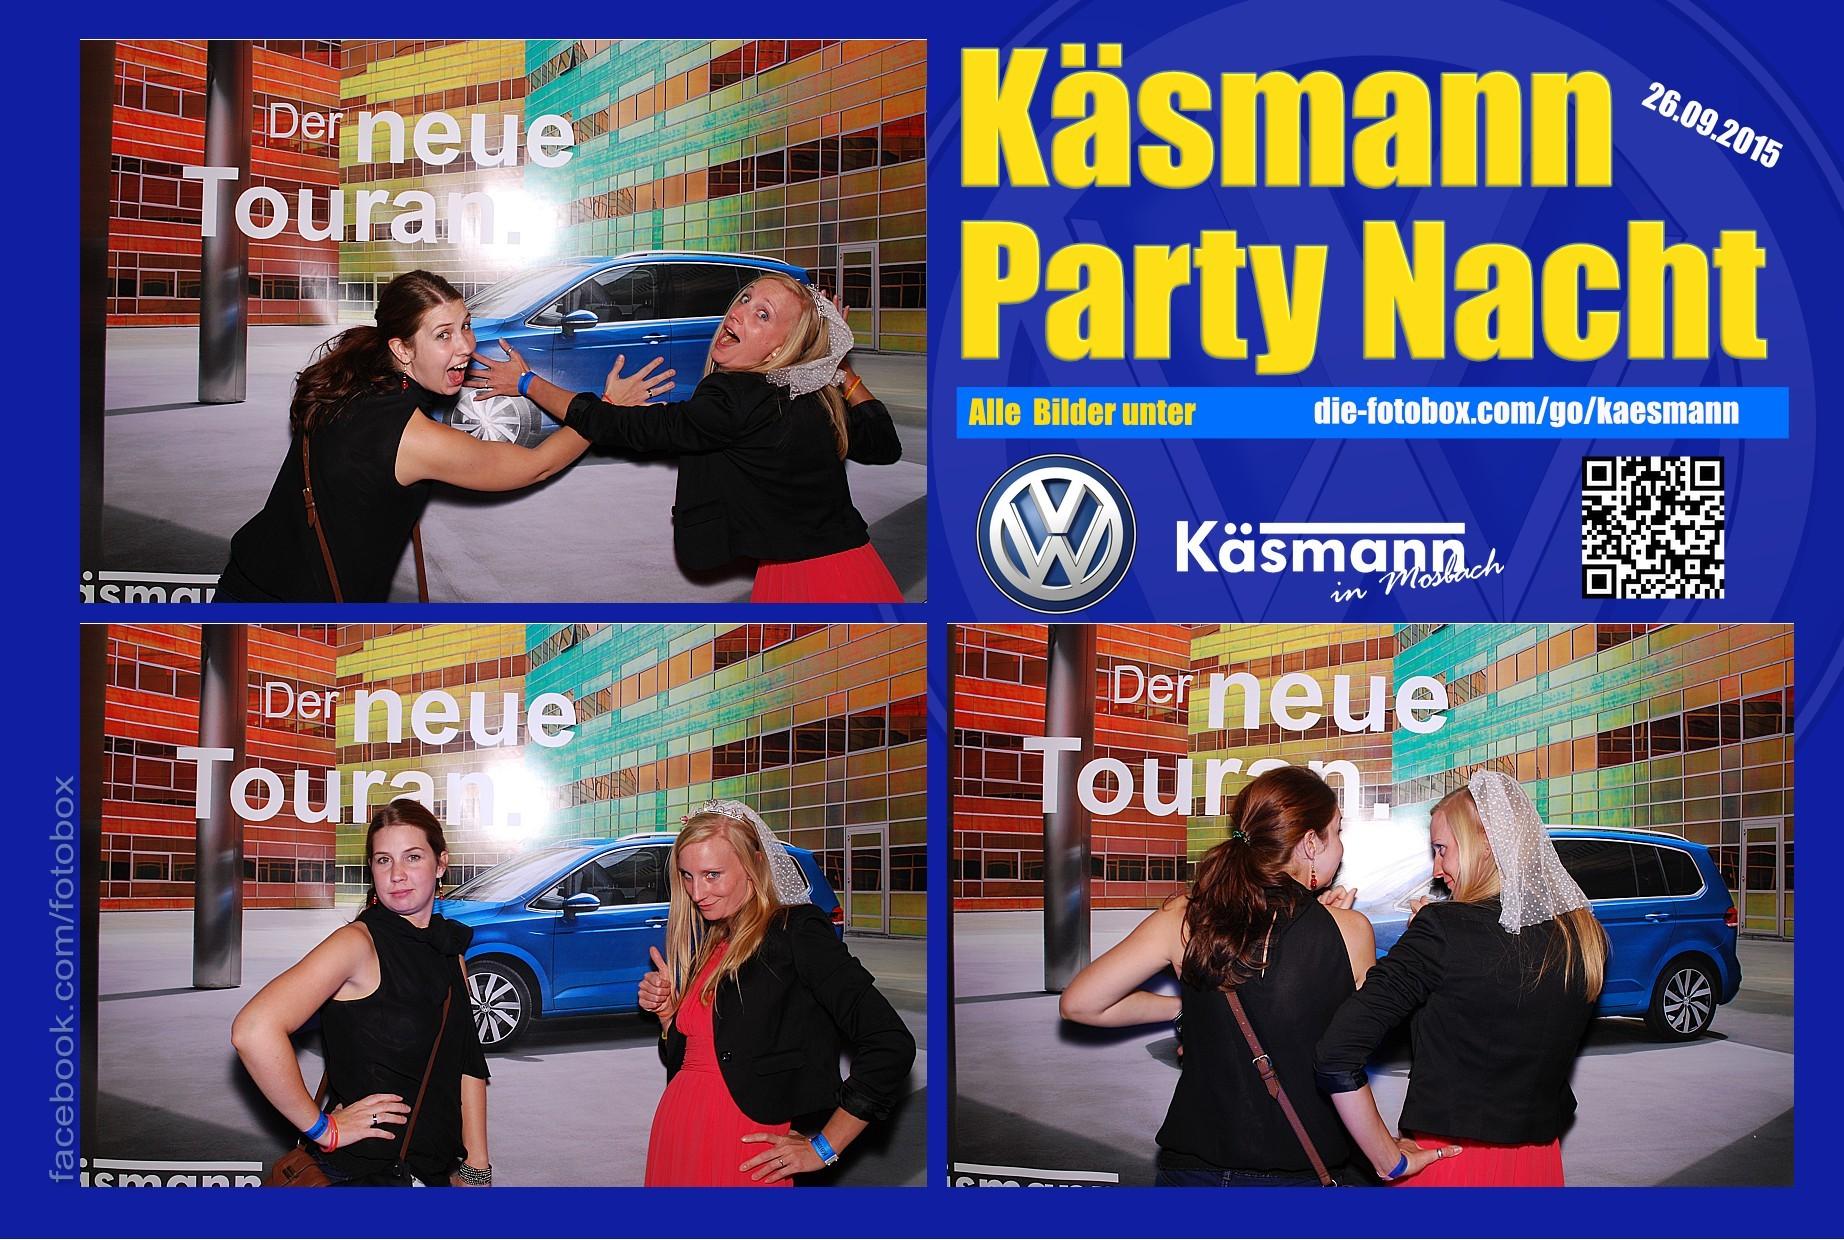 Käsmannparty 2015 - www.die-fotobox.com 01024